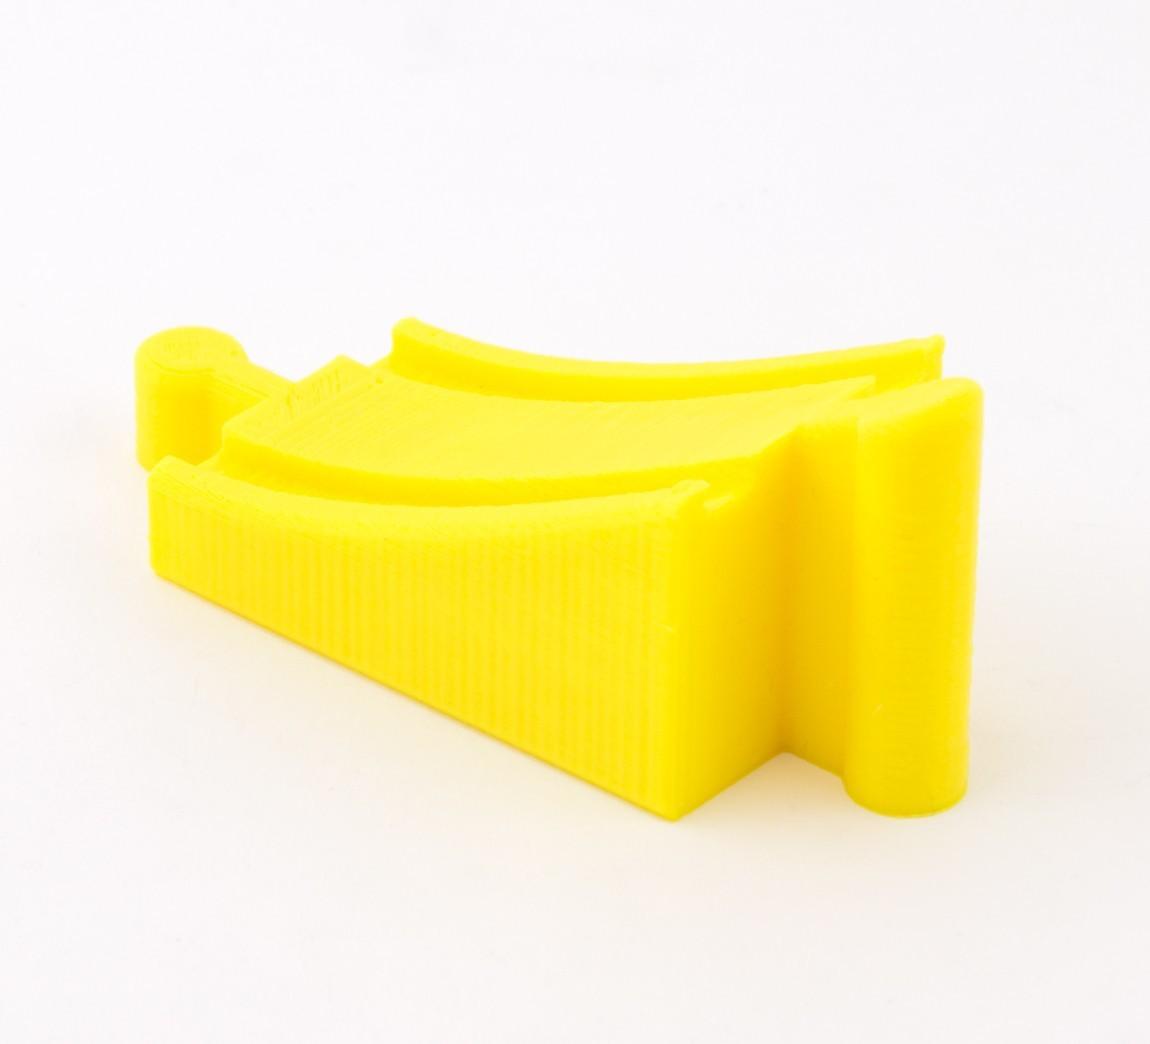 91cb4f62ceb4627f4039d91b0e40adb8_1449686635666_12.2.15-product-shoot-059.jpg Download free STL file Toy Train Tracks • 3D printer design, FerryTeacher